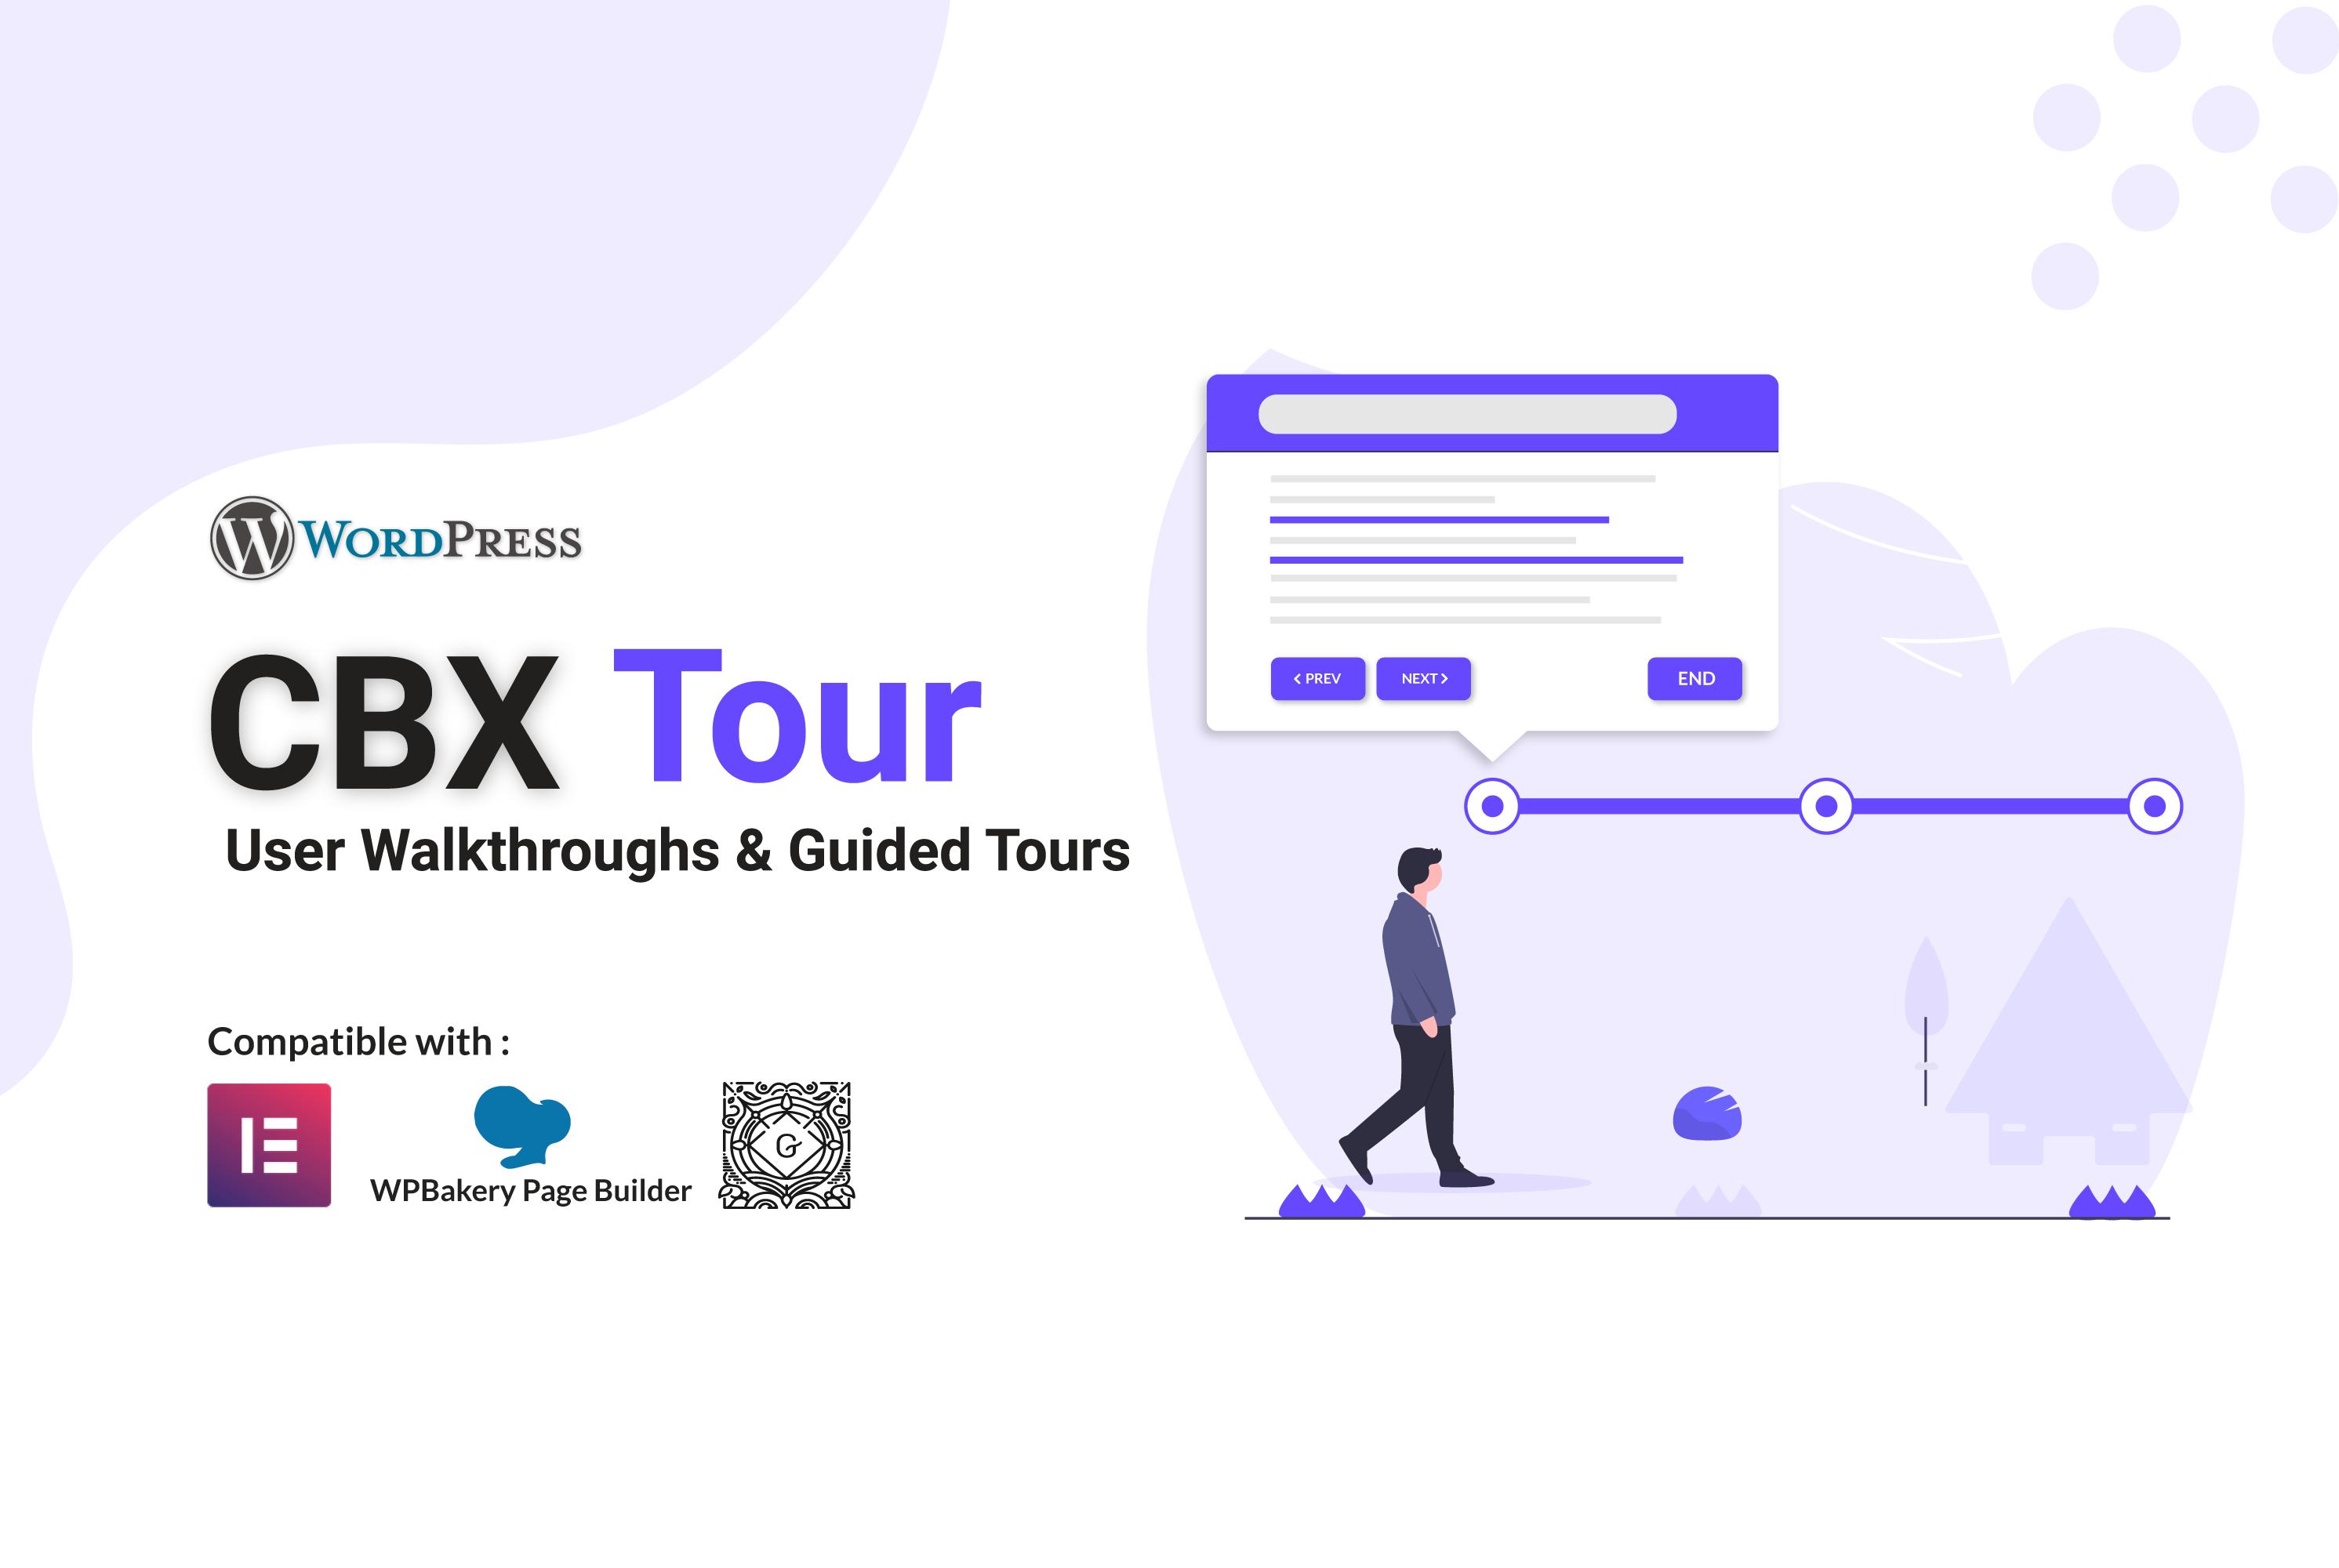 CBX Tour – User Walkthroughs & Guided Tours for WordPress